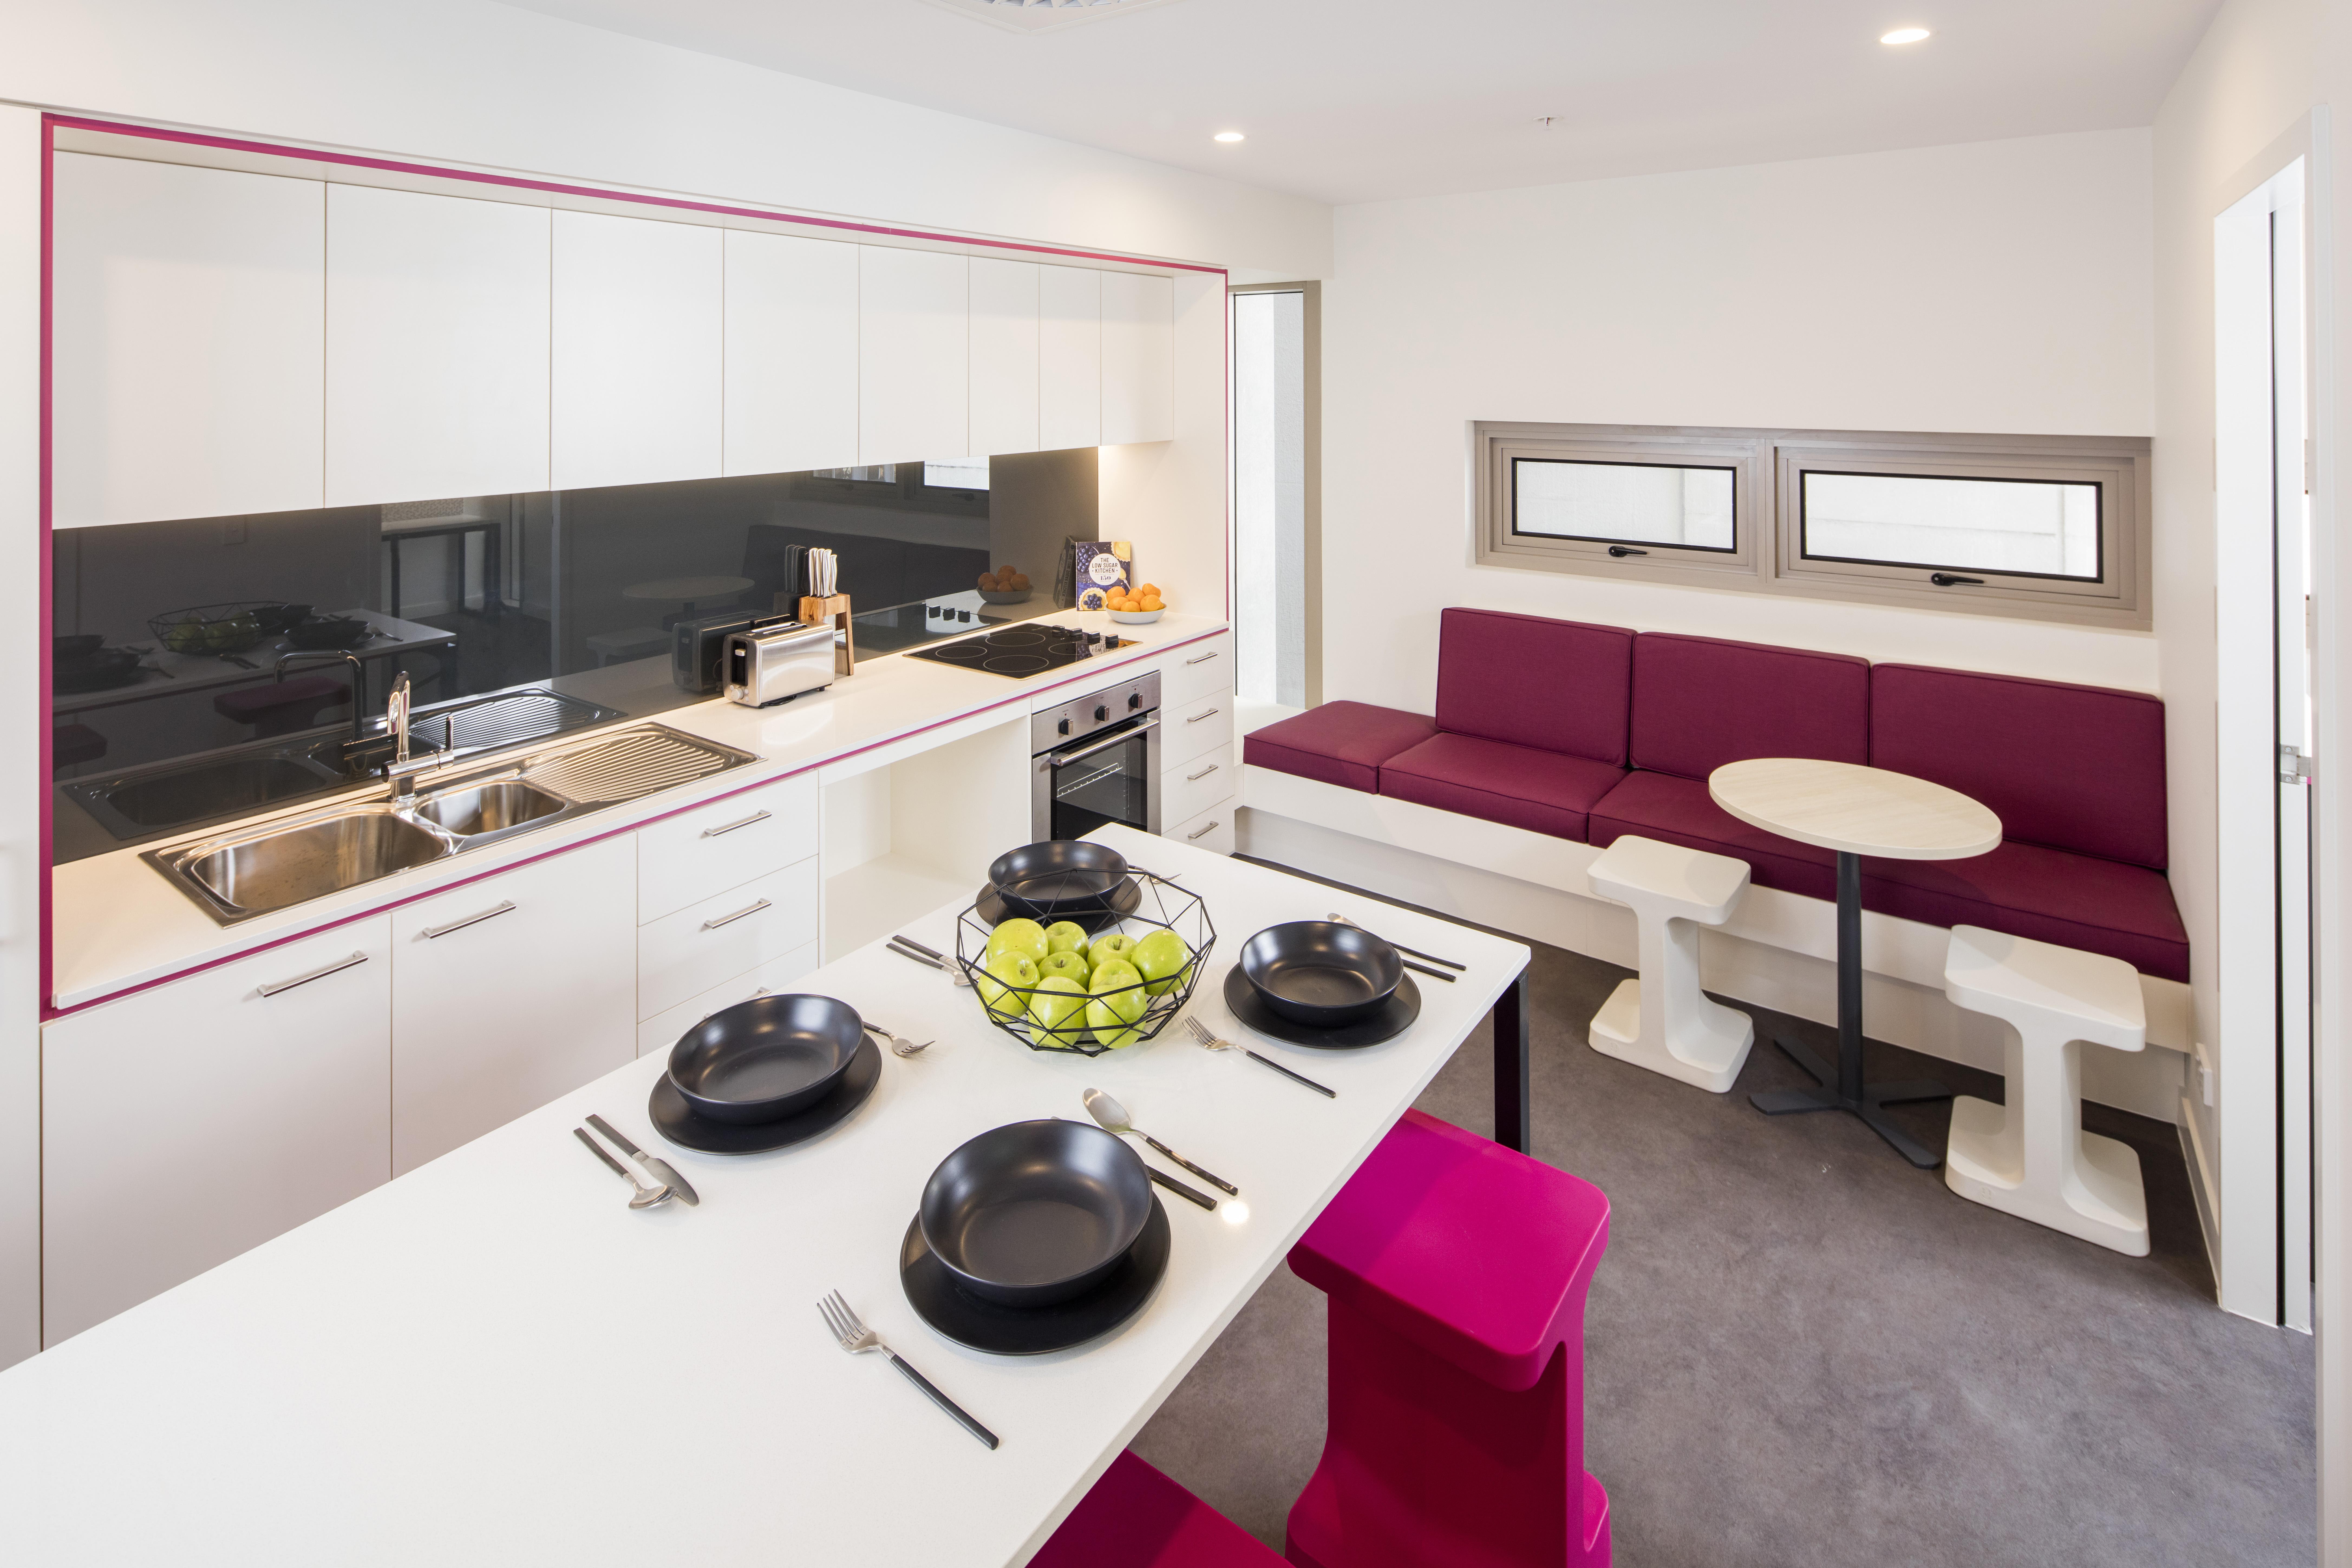 Student Apartments in Brisbane, Australia